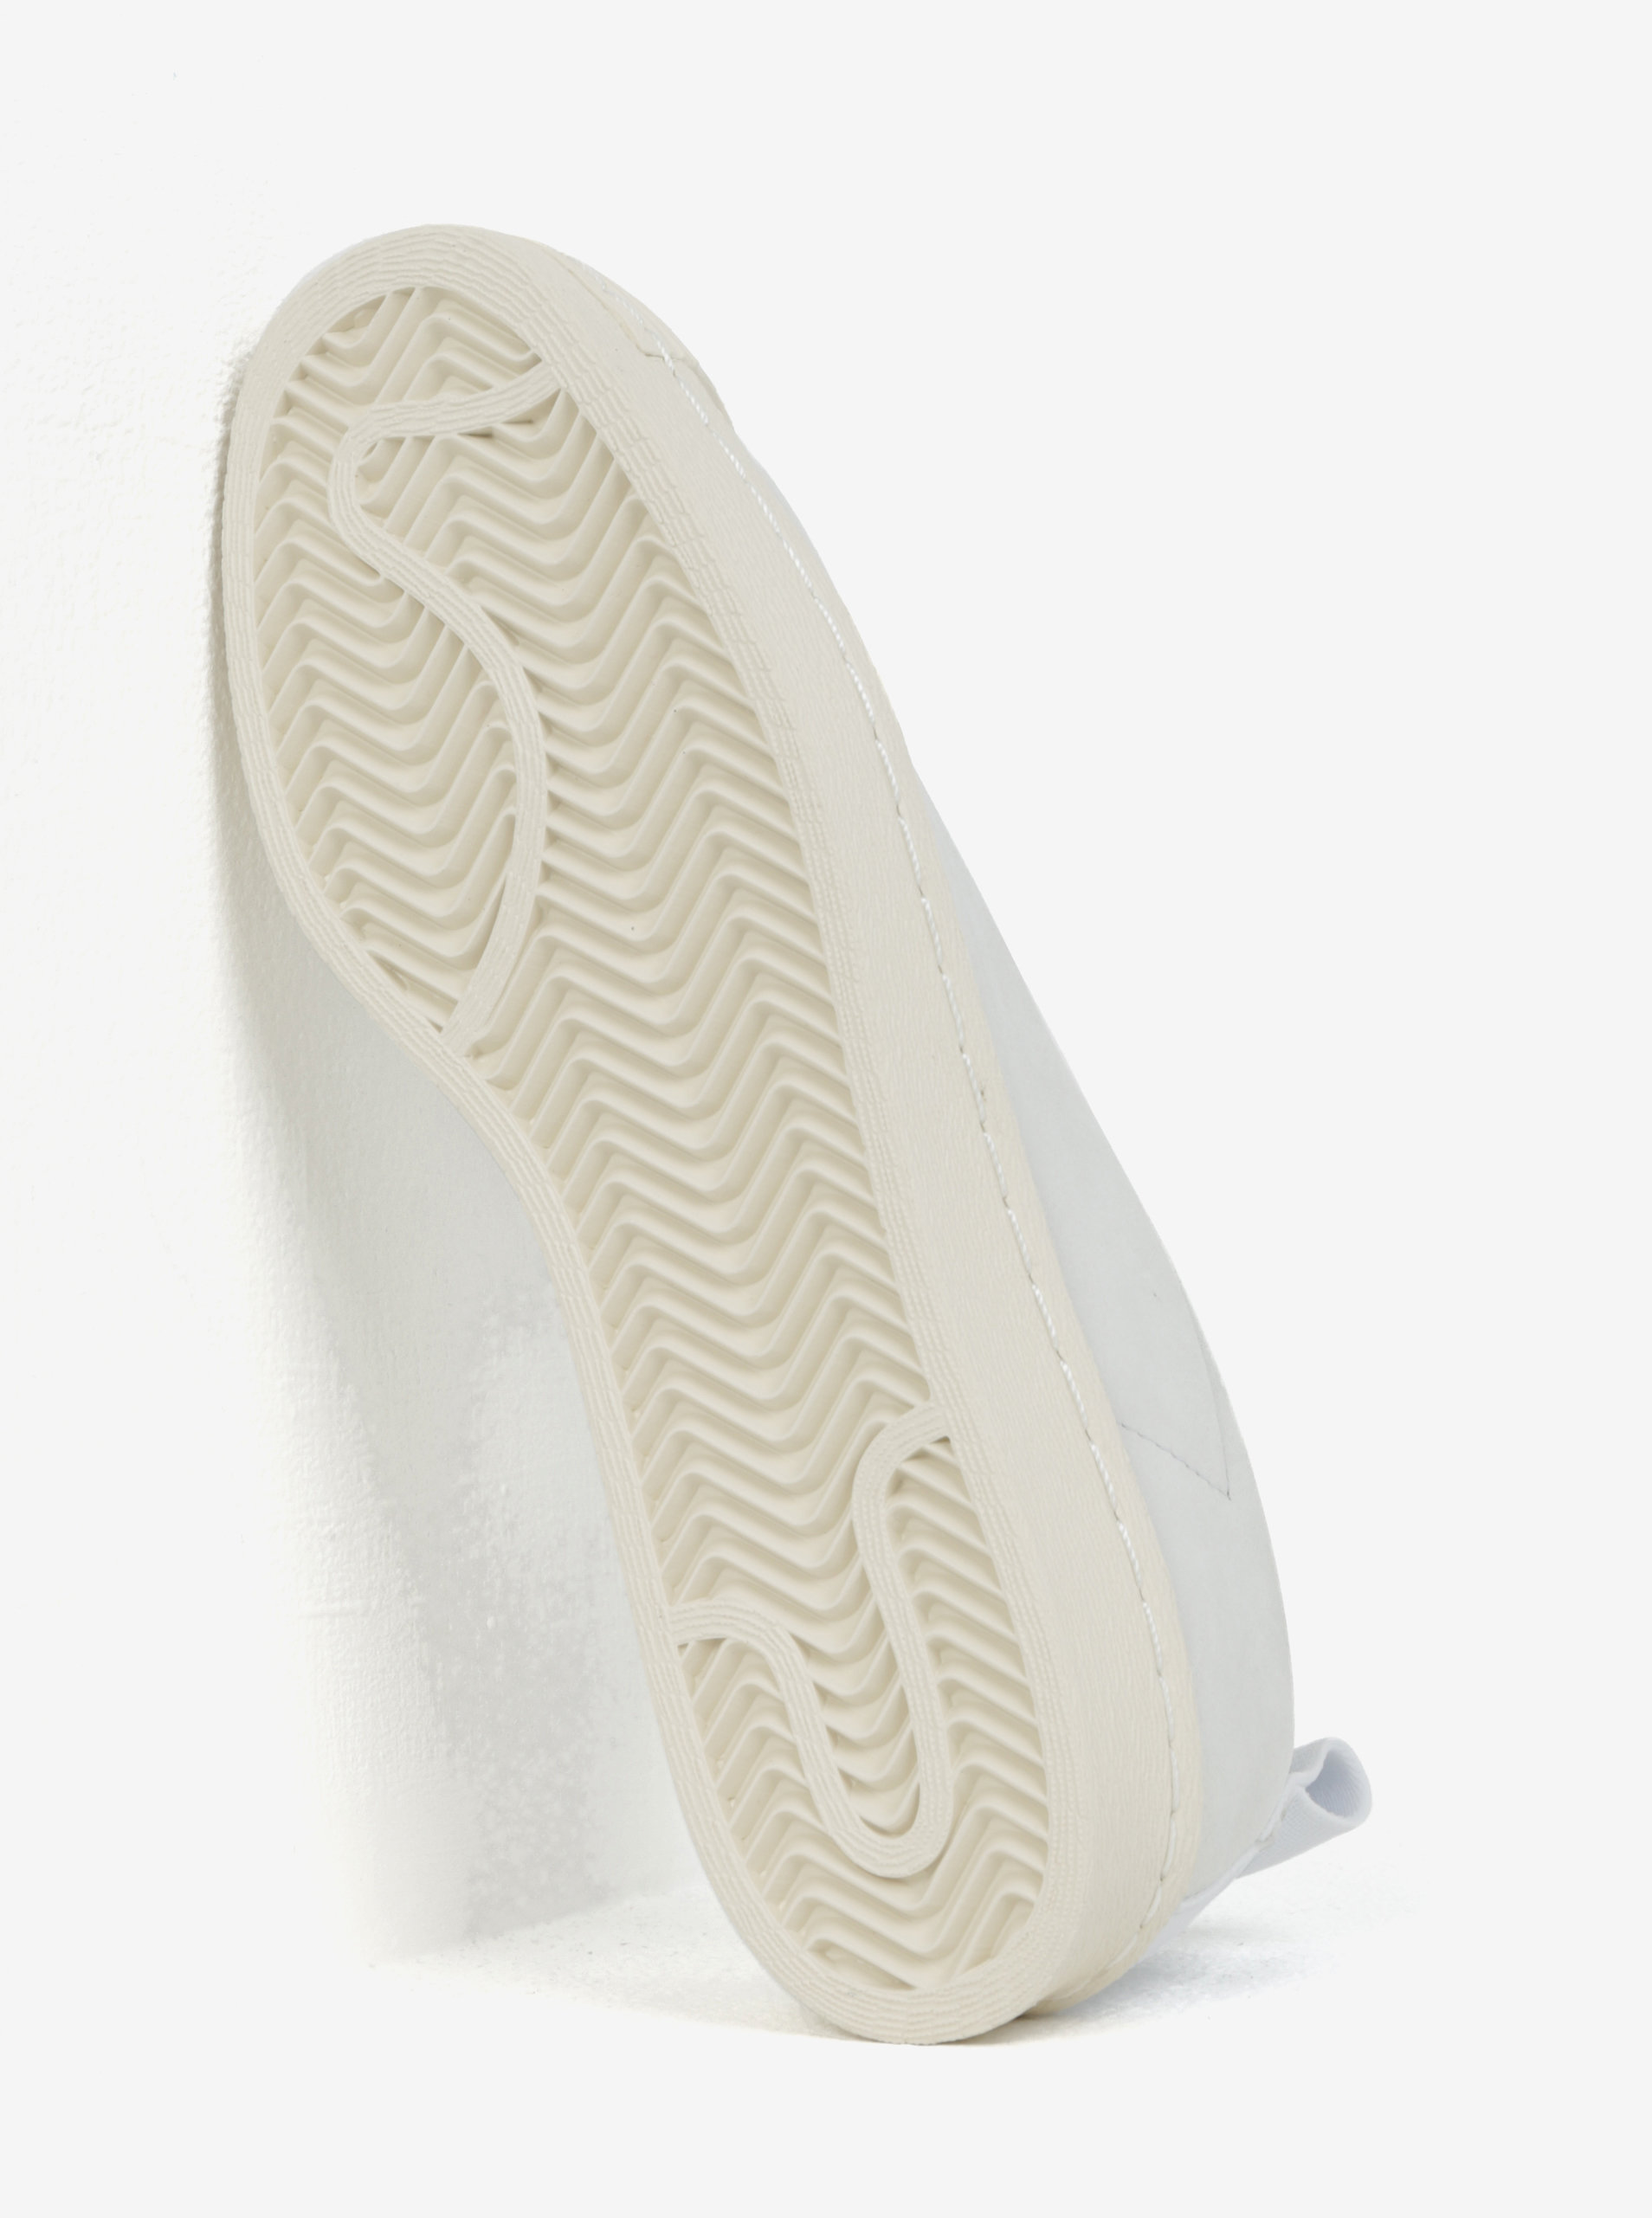 Biele dámske kožené slip on adidas Originals Tubular Superstar ... c658b63146d